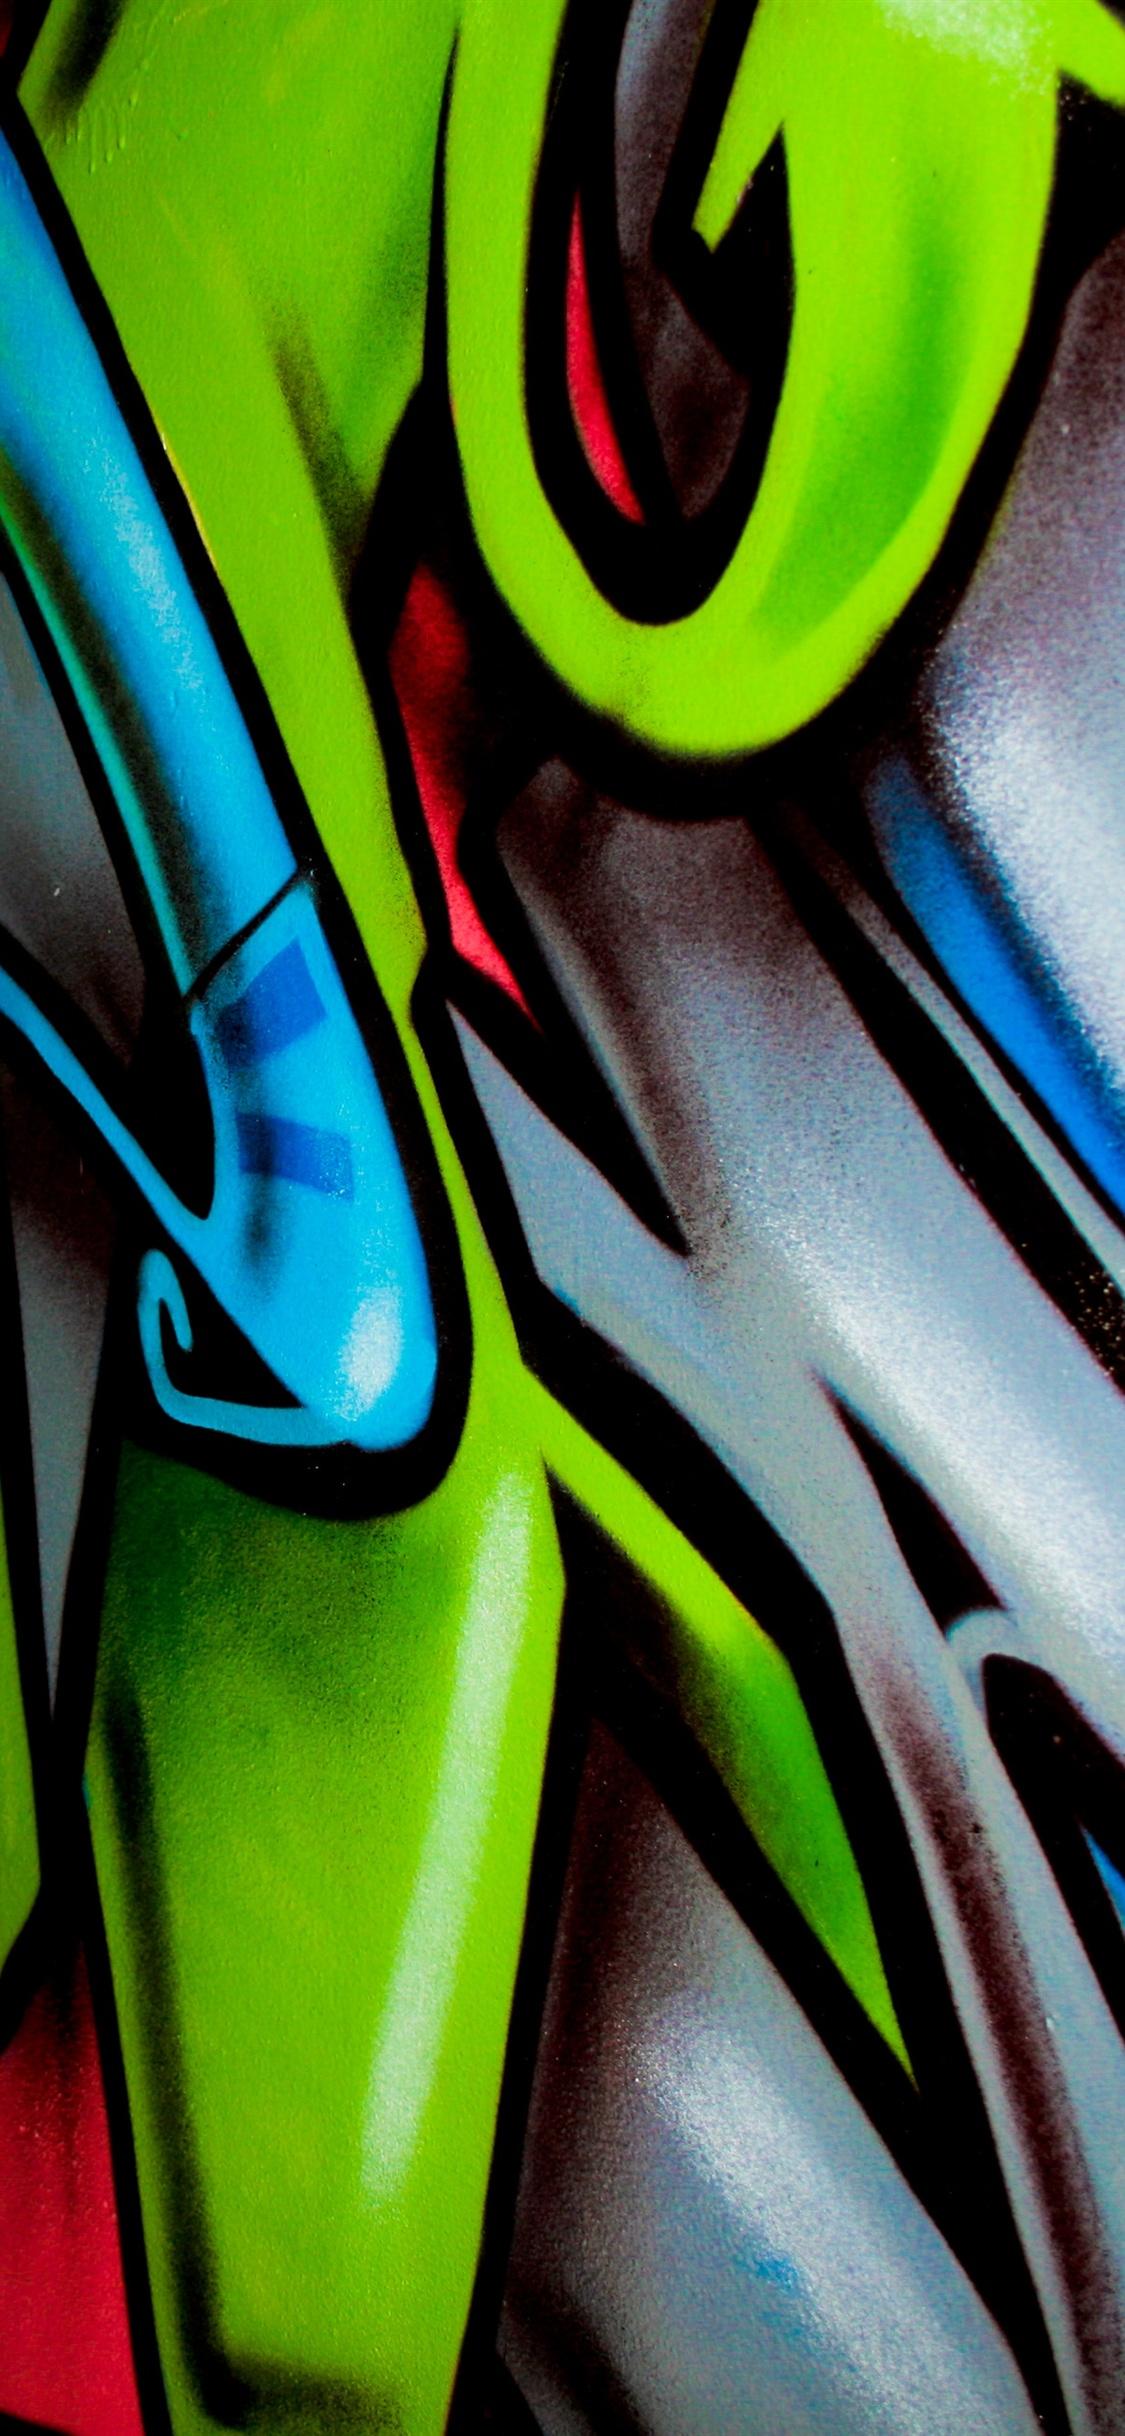 X - 1080 X 1920 Wallpaper Hd Graffiti , HD Wallpaper & Backgrounds